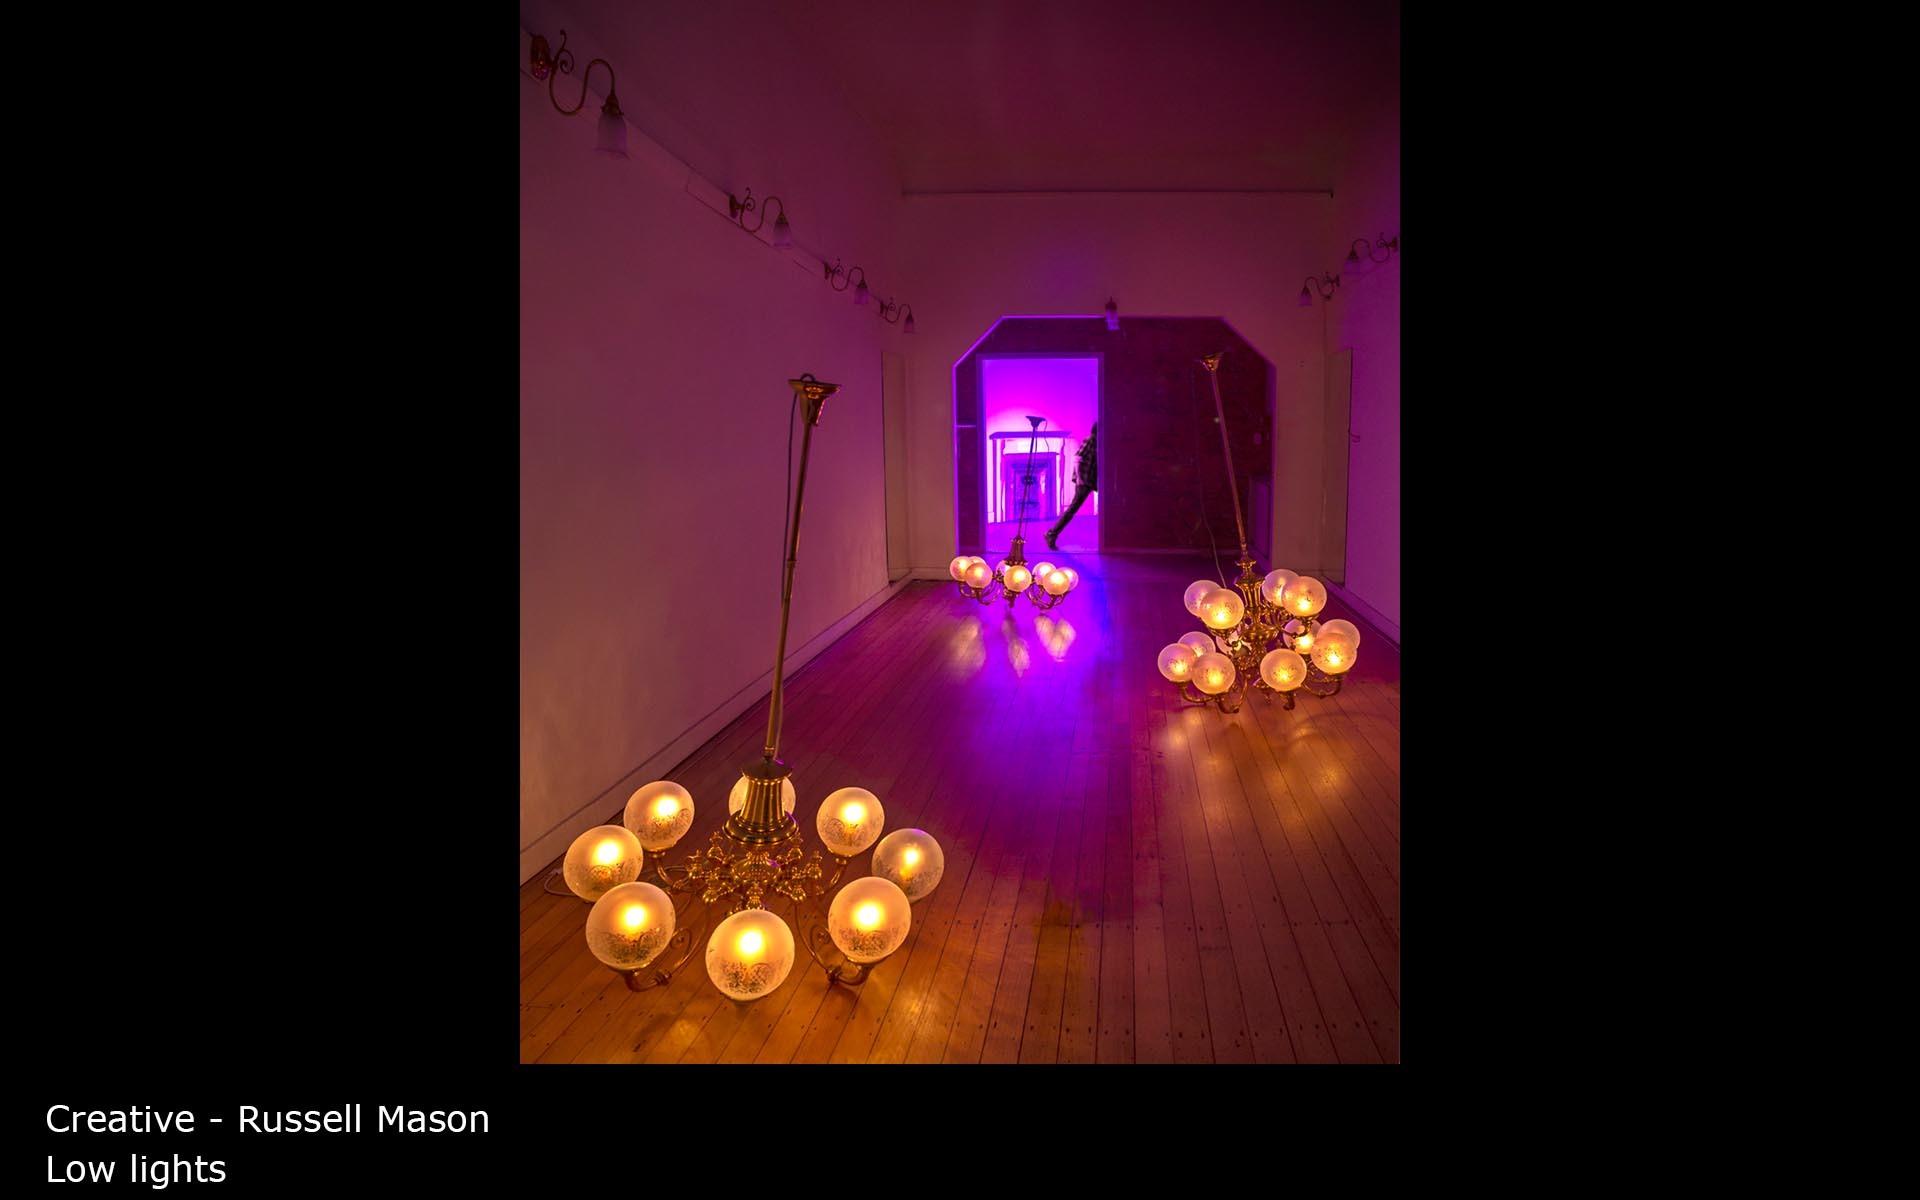 Low lights - Russell Mason